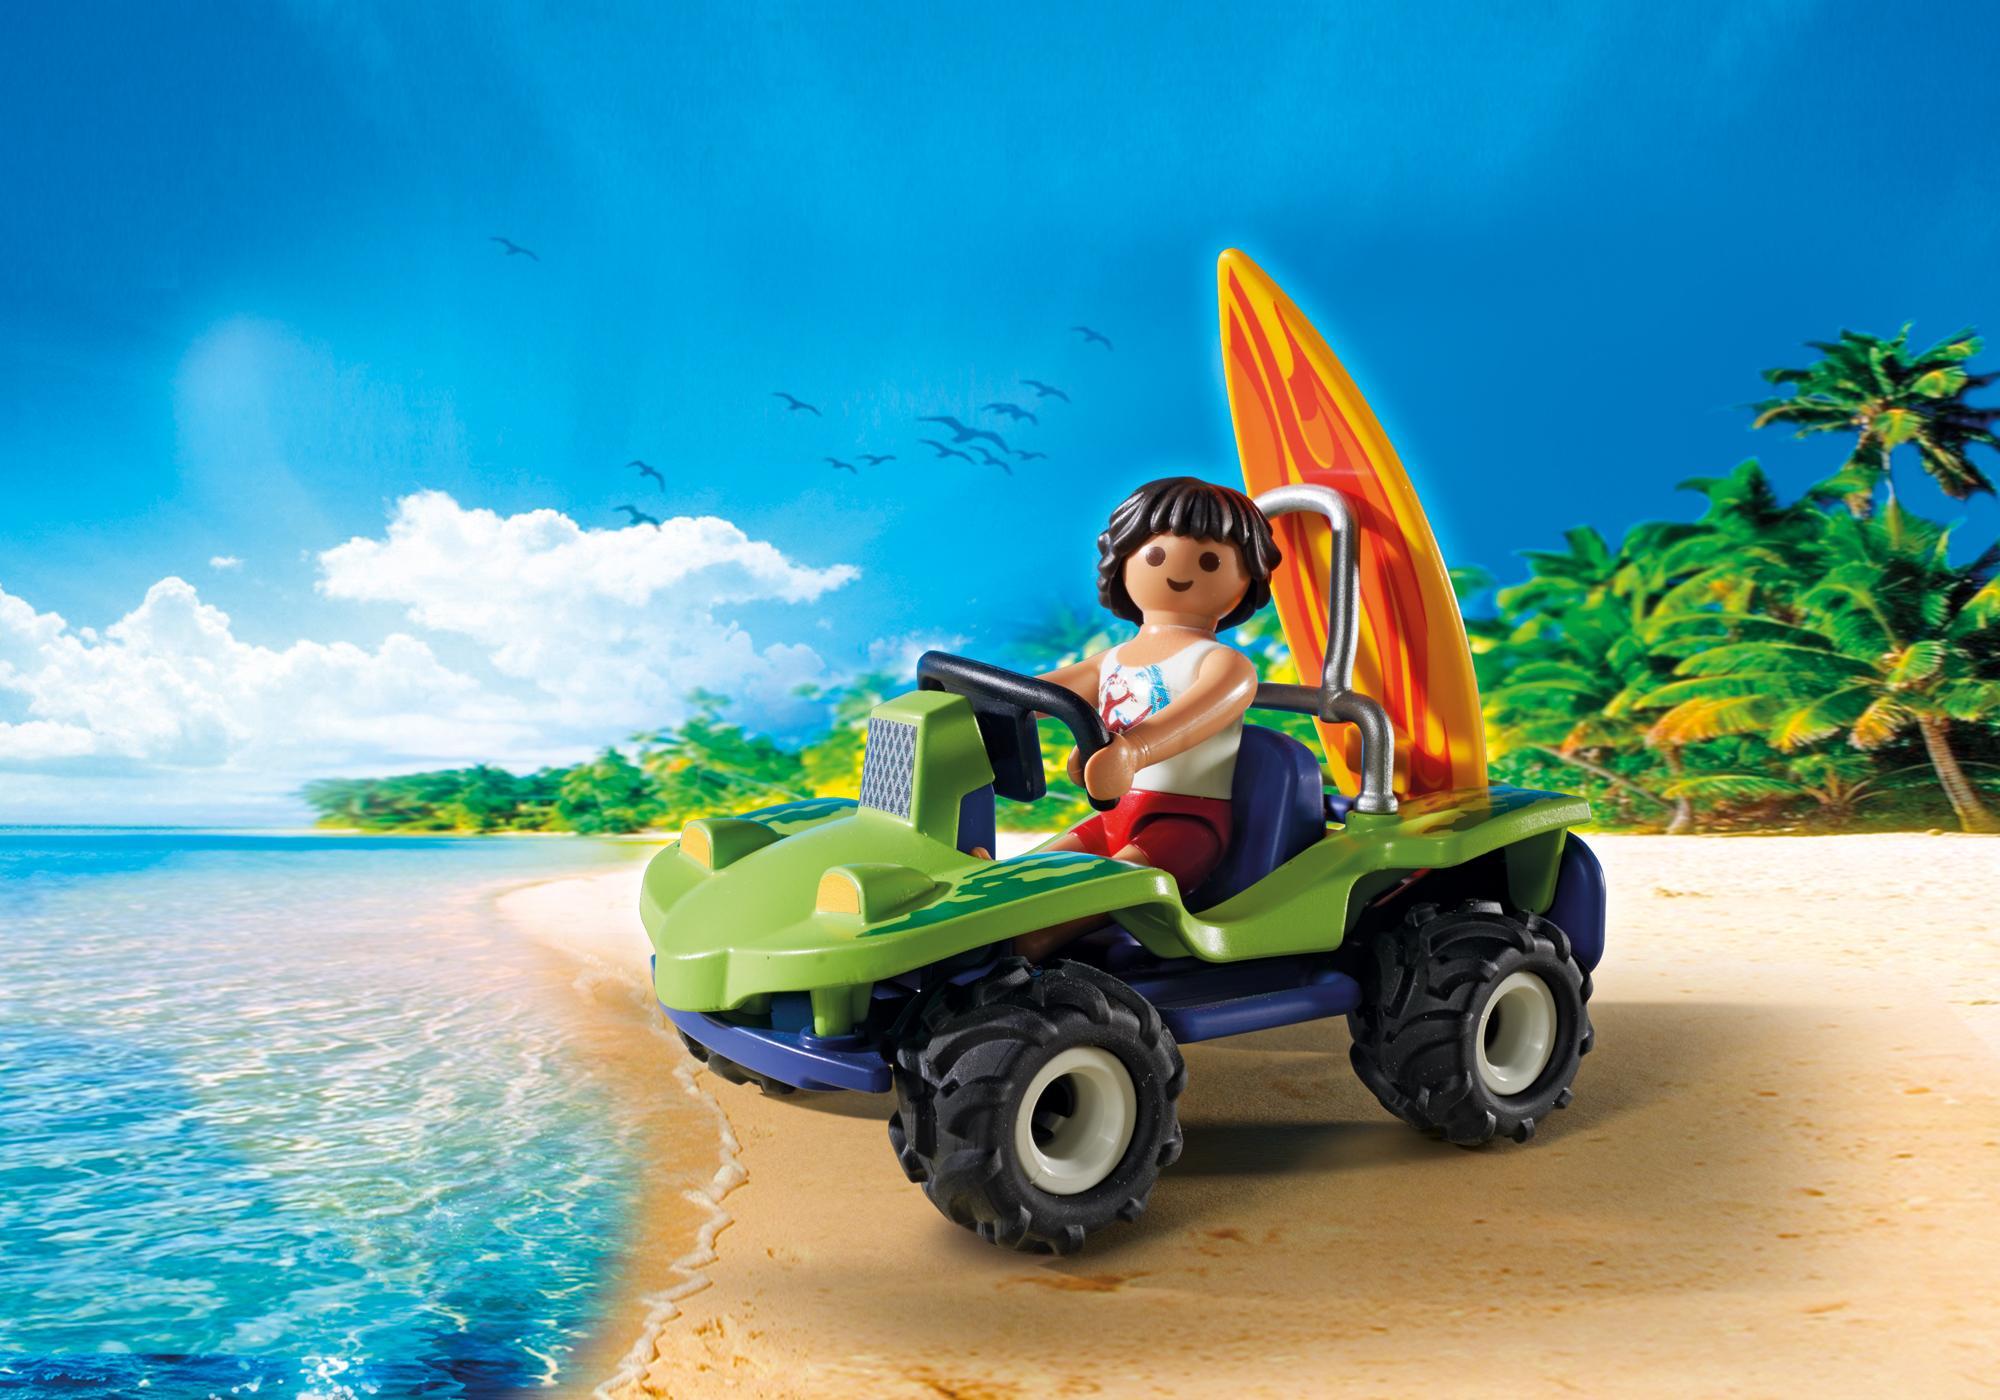 http://media.playmobil.com/i/playmobil/6982_product_extra1/Surfer z buggy